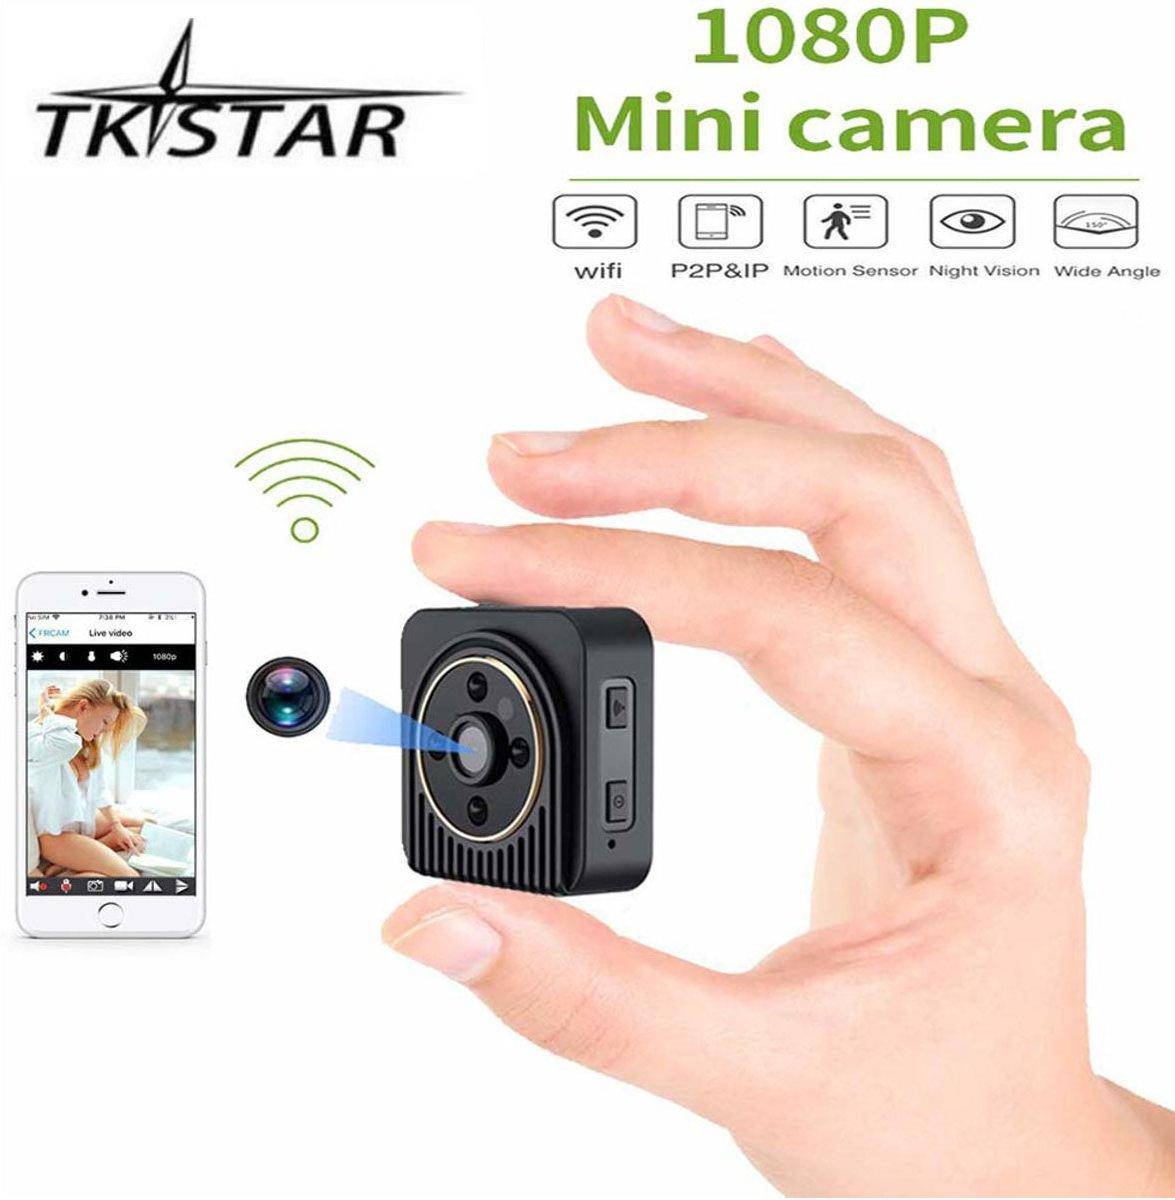 TKSTAR Spy Camera, draadloze wifi IP-camera HD DV verborgen videorecorder Nachtzicht Home Surveillance bewakingscamera kopen